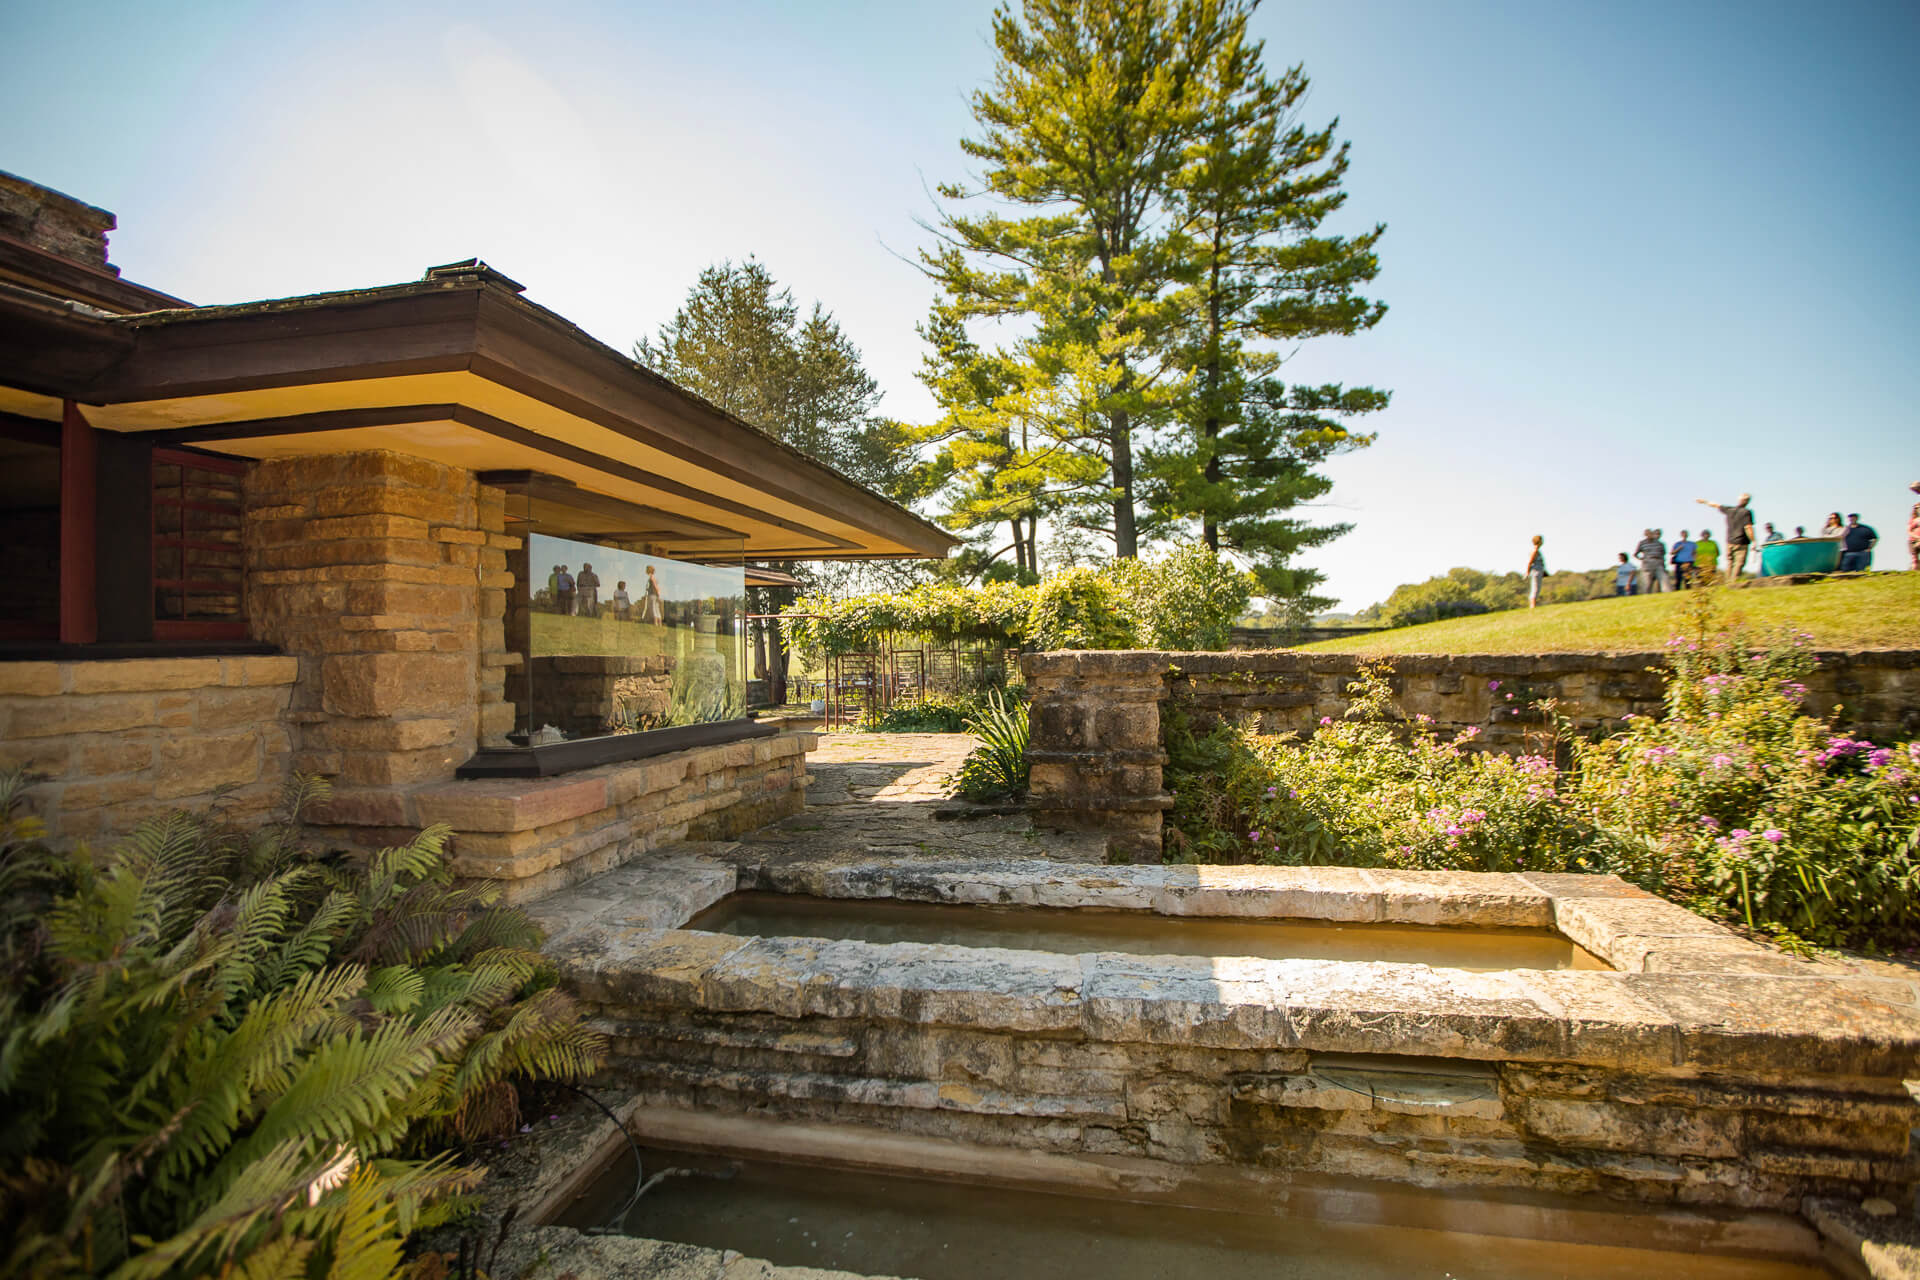 Garden Pools at Taliesin Estate